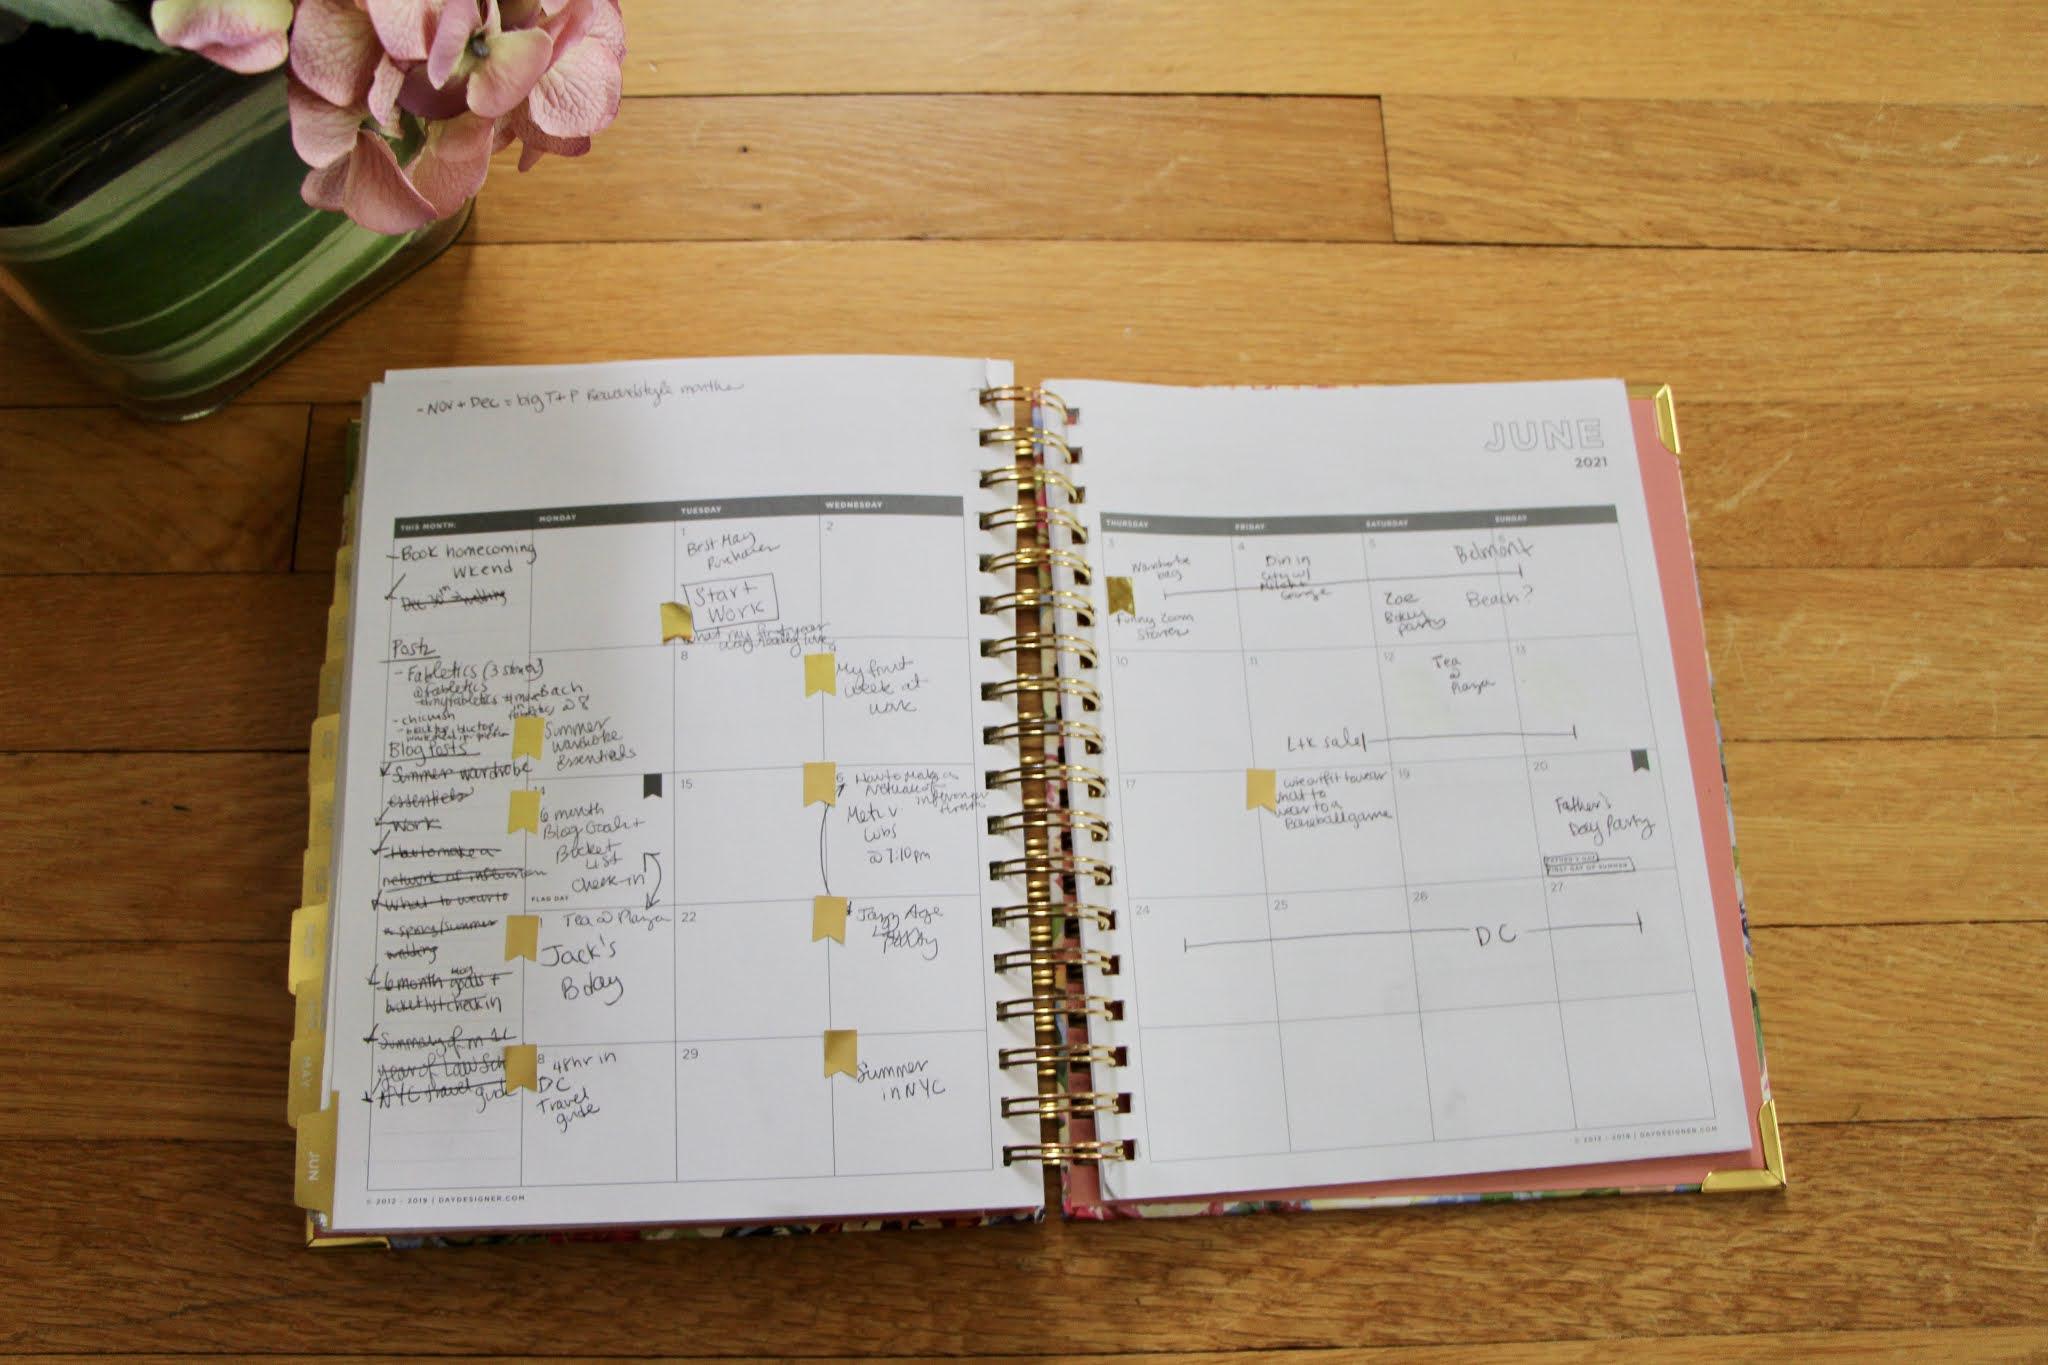 Day designer planner, monthly planner